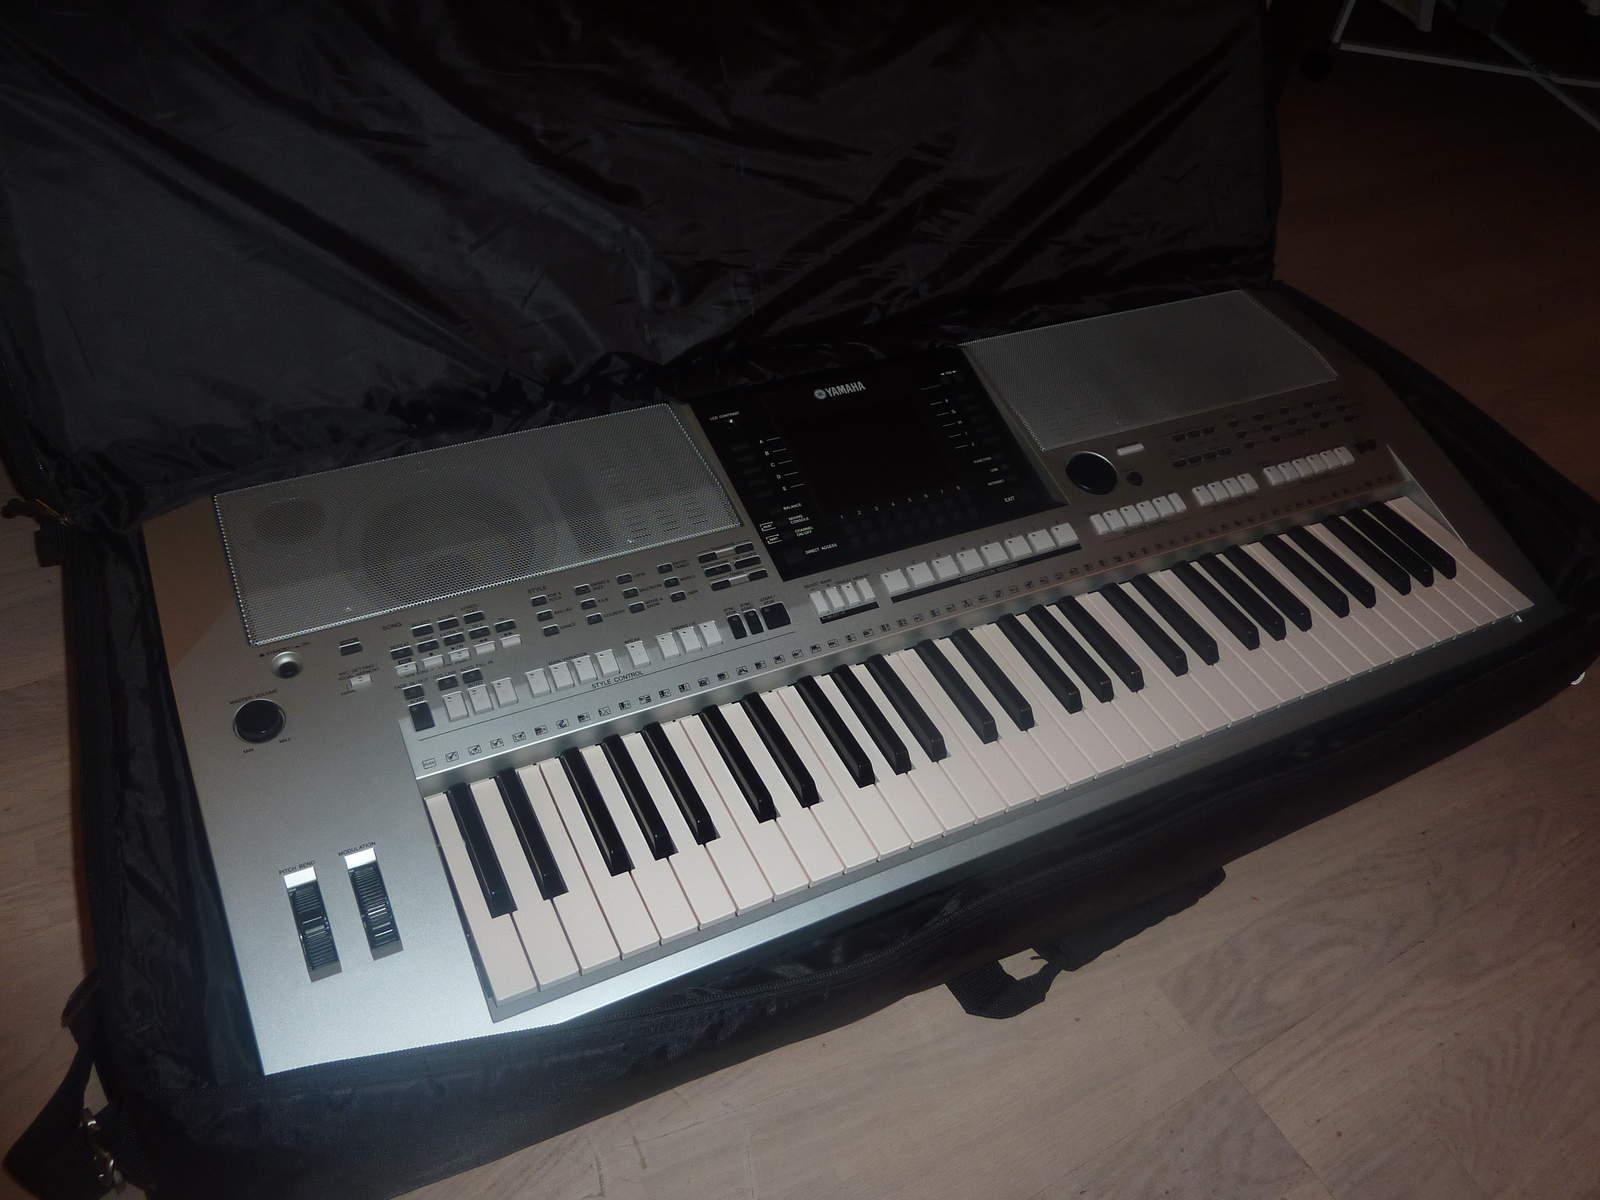 Yamaha psr s900 image 163953 audiofanzine for Psr s900 yamaha